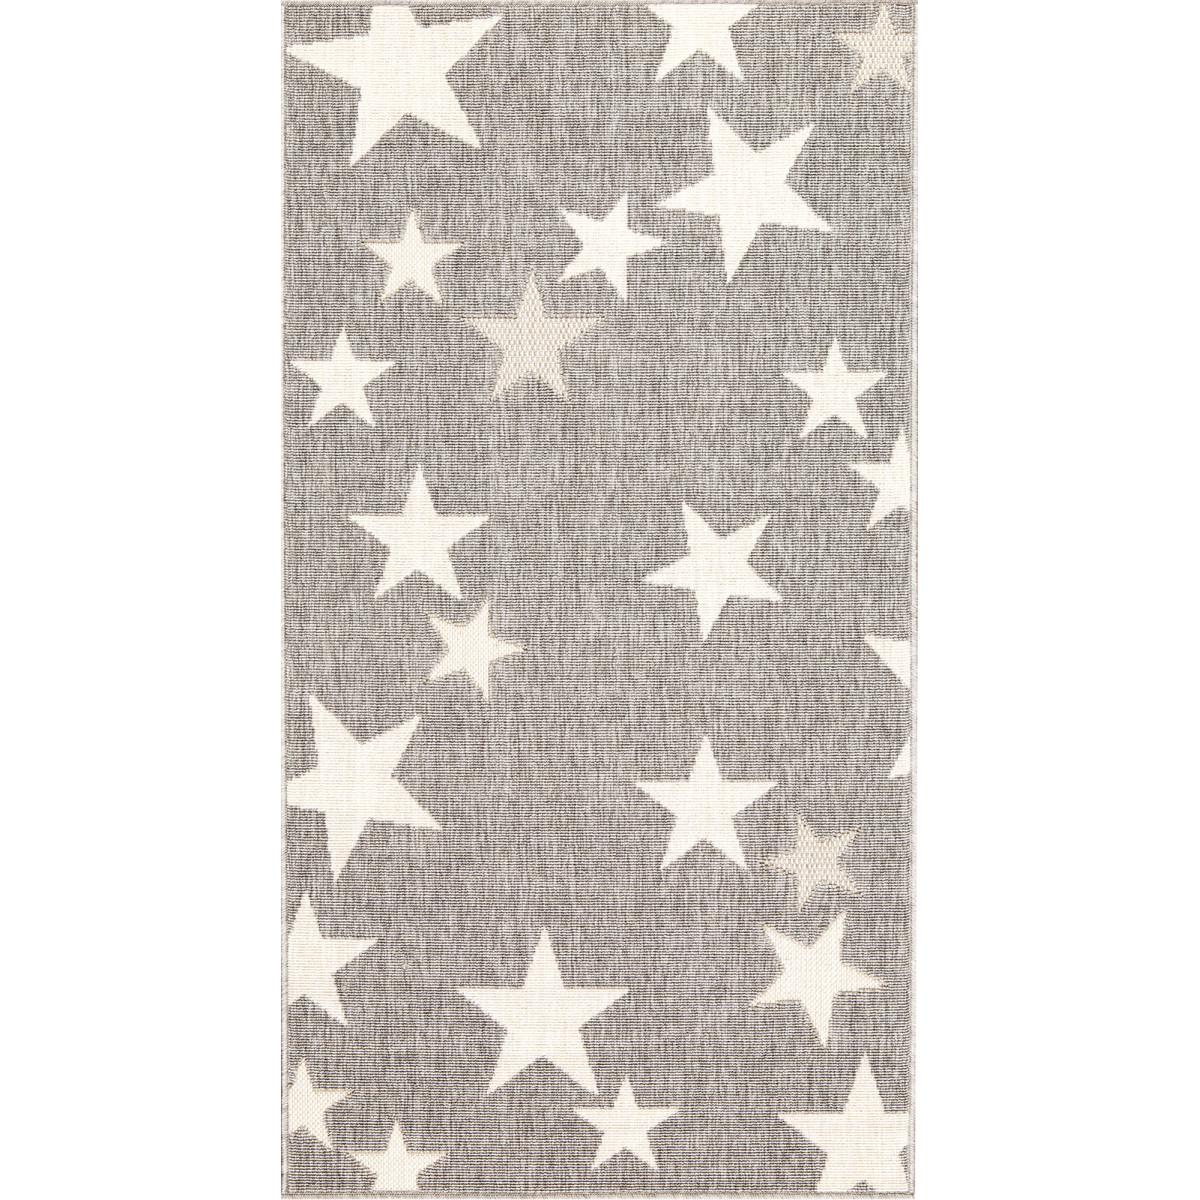 Ковёр Fenix 20422/332 0.8х1.5 м цвет серый